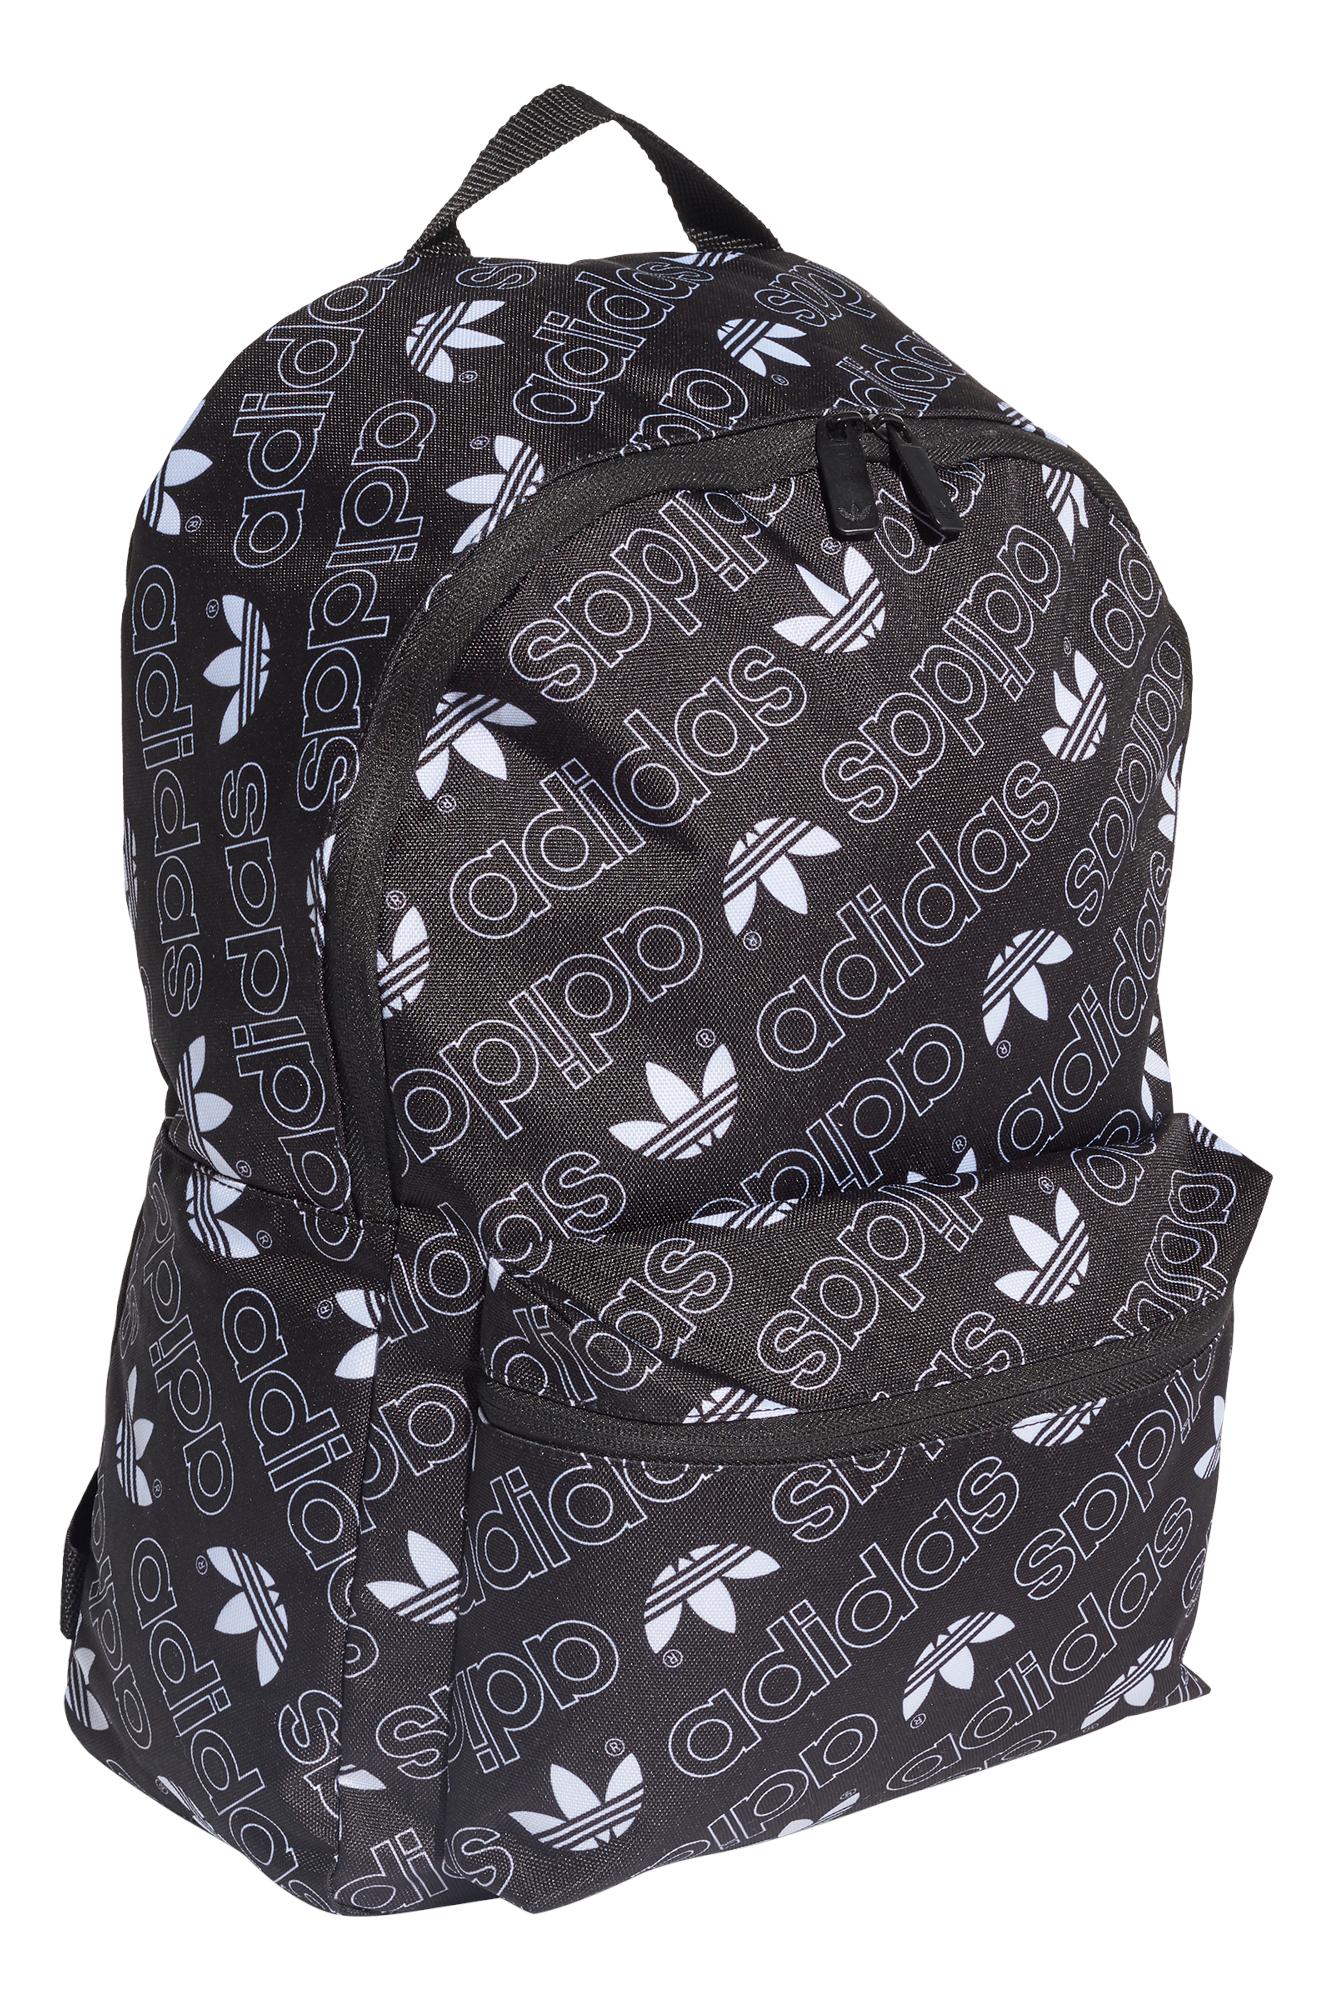 sklep gorące produkty dobrze out x Plecak adidas Originals Monogram Classic - ED8659 / Plecaki ...